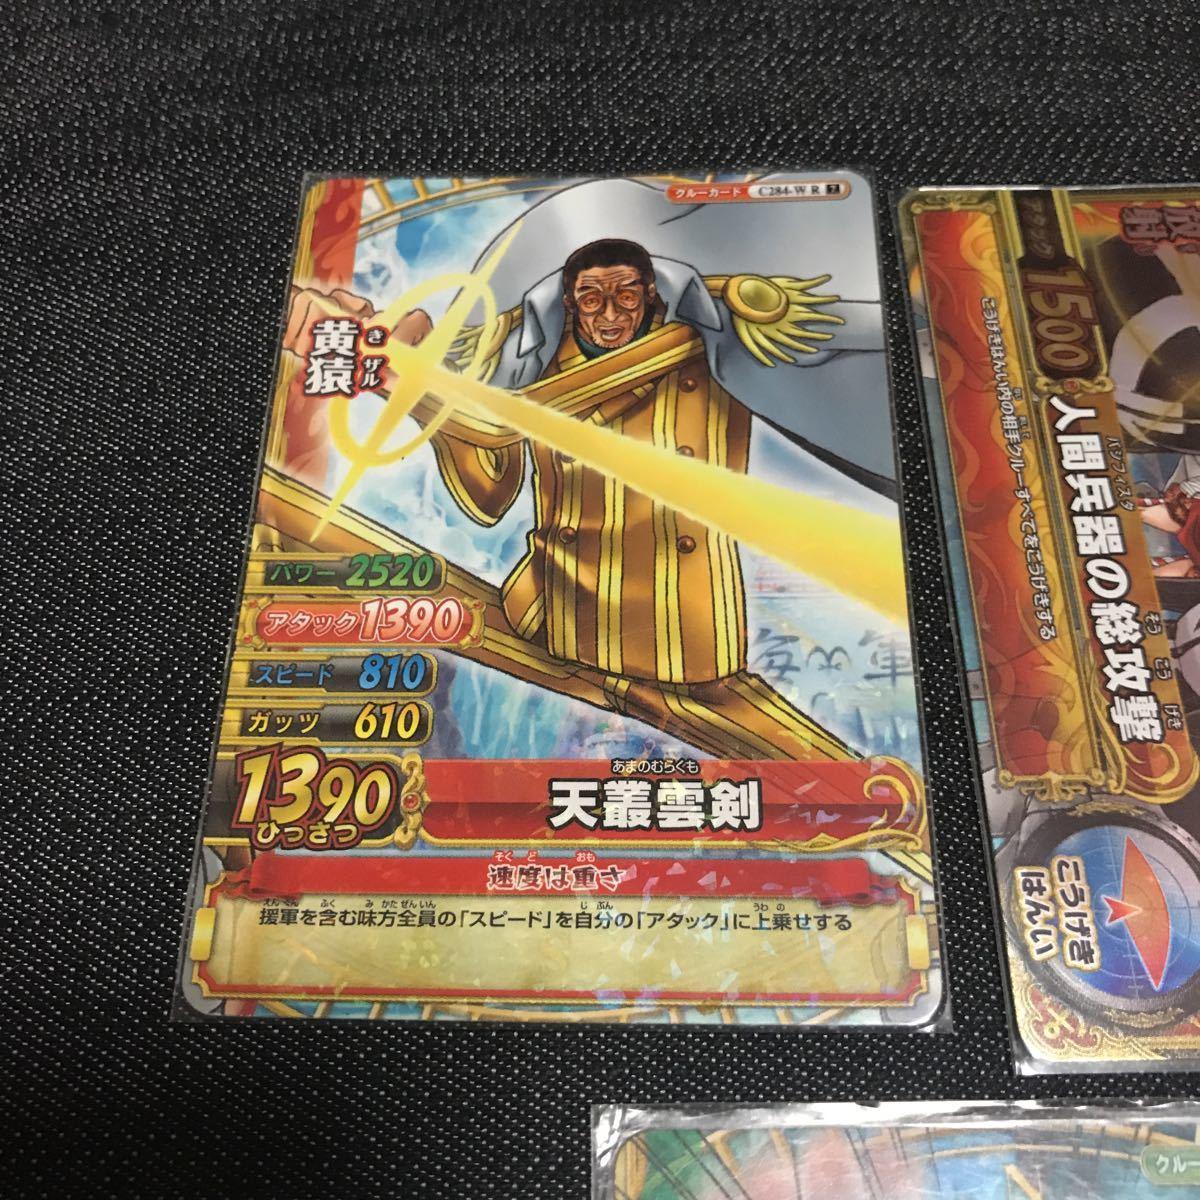 【ONE PIECE】ワンピーベリーマッチダブル 黄猿 ボルサリーノ & 戦桃丸 セット_画像2